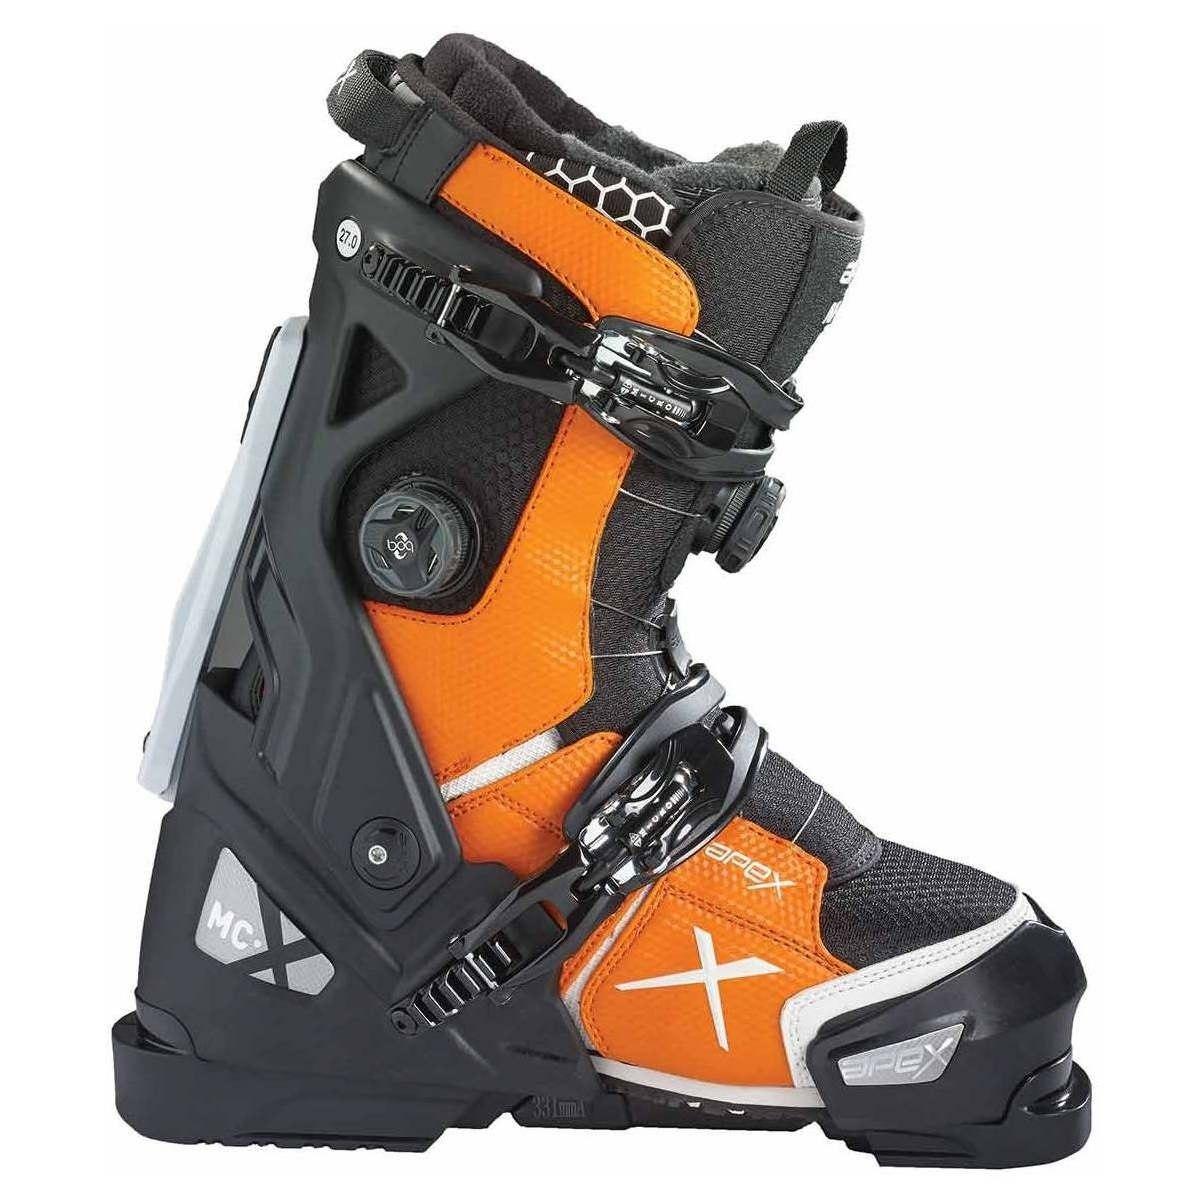 Ski Boots Sale >> Apex Men S Mc X Ski Boots On Sale Powder7 Com